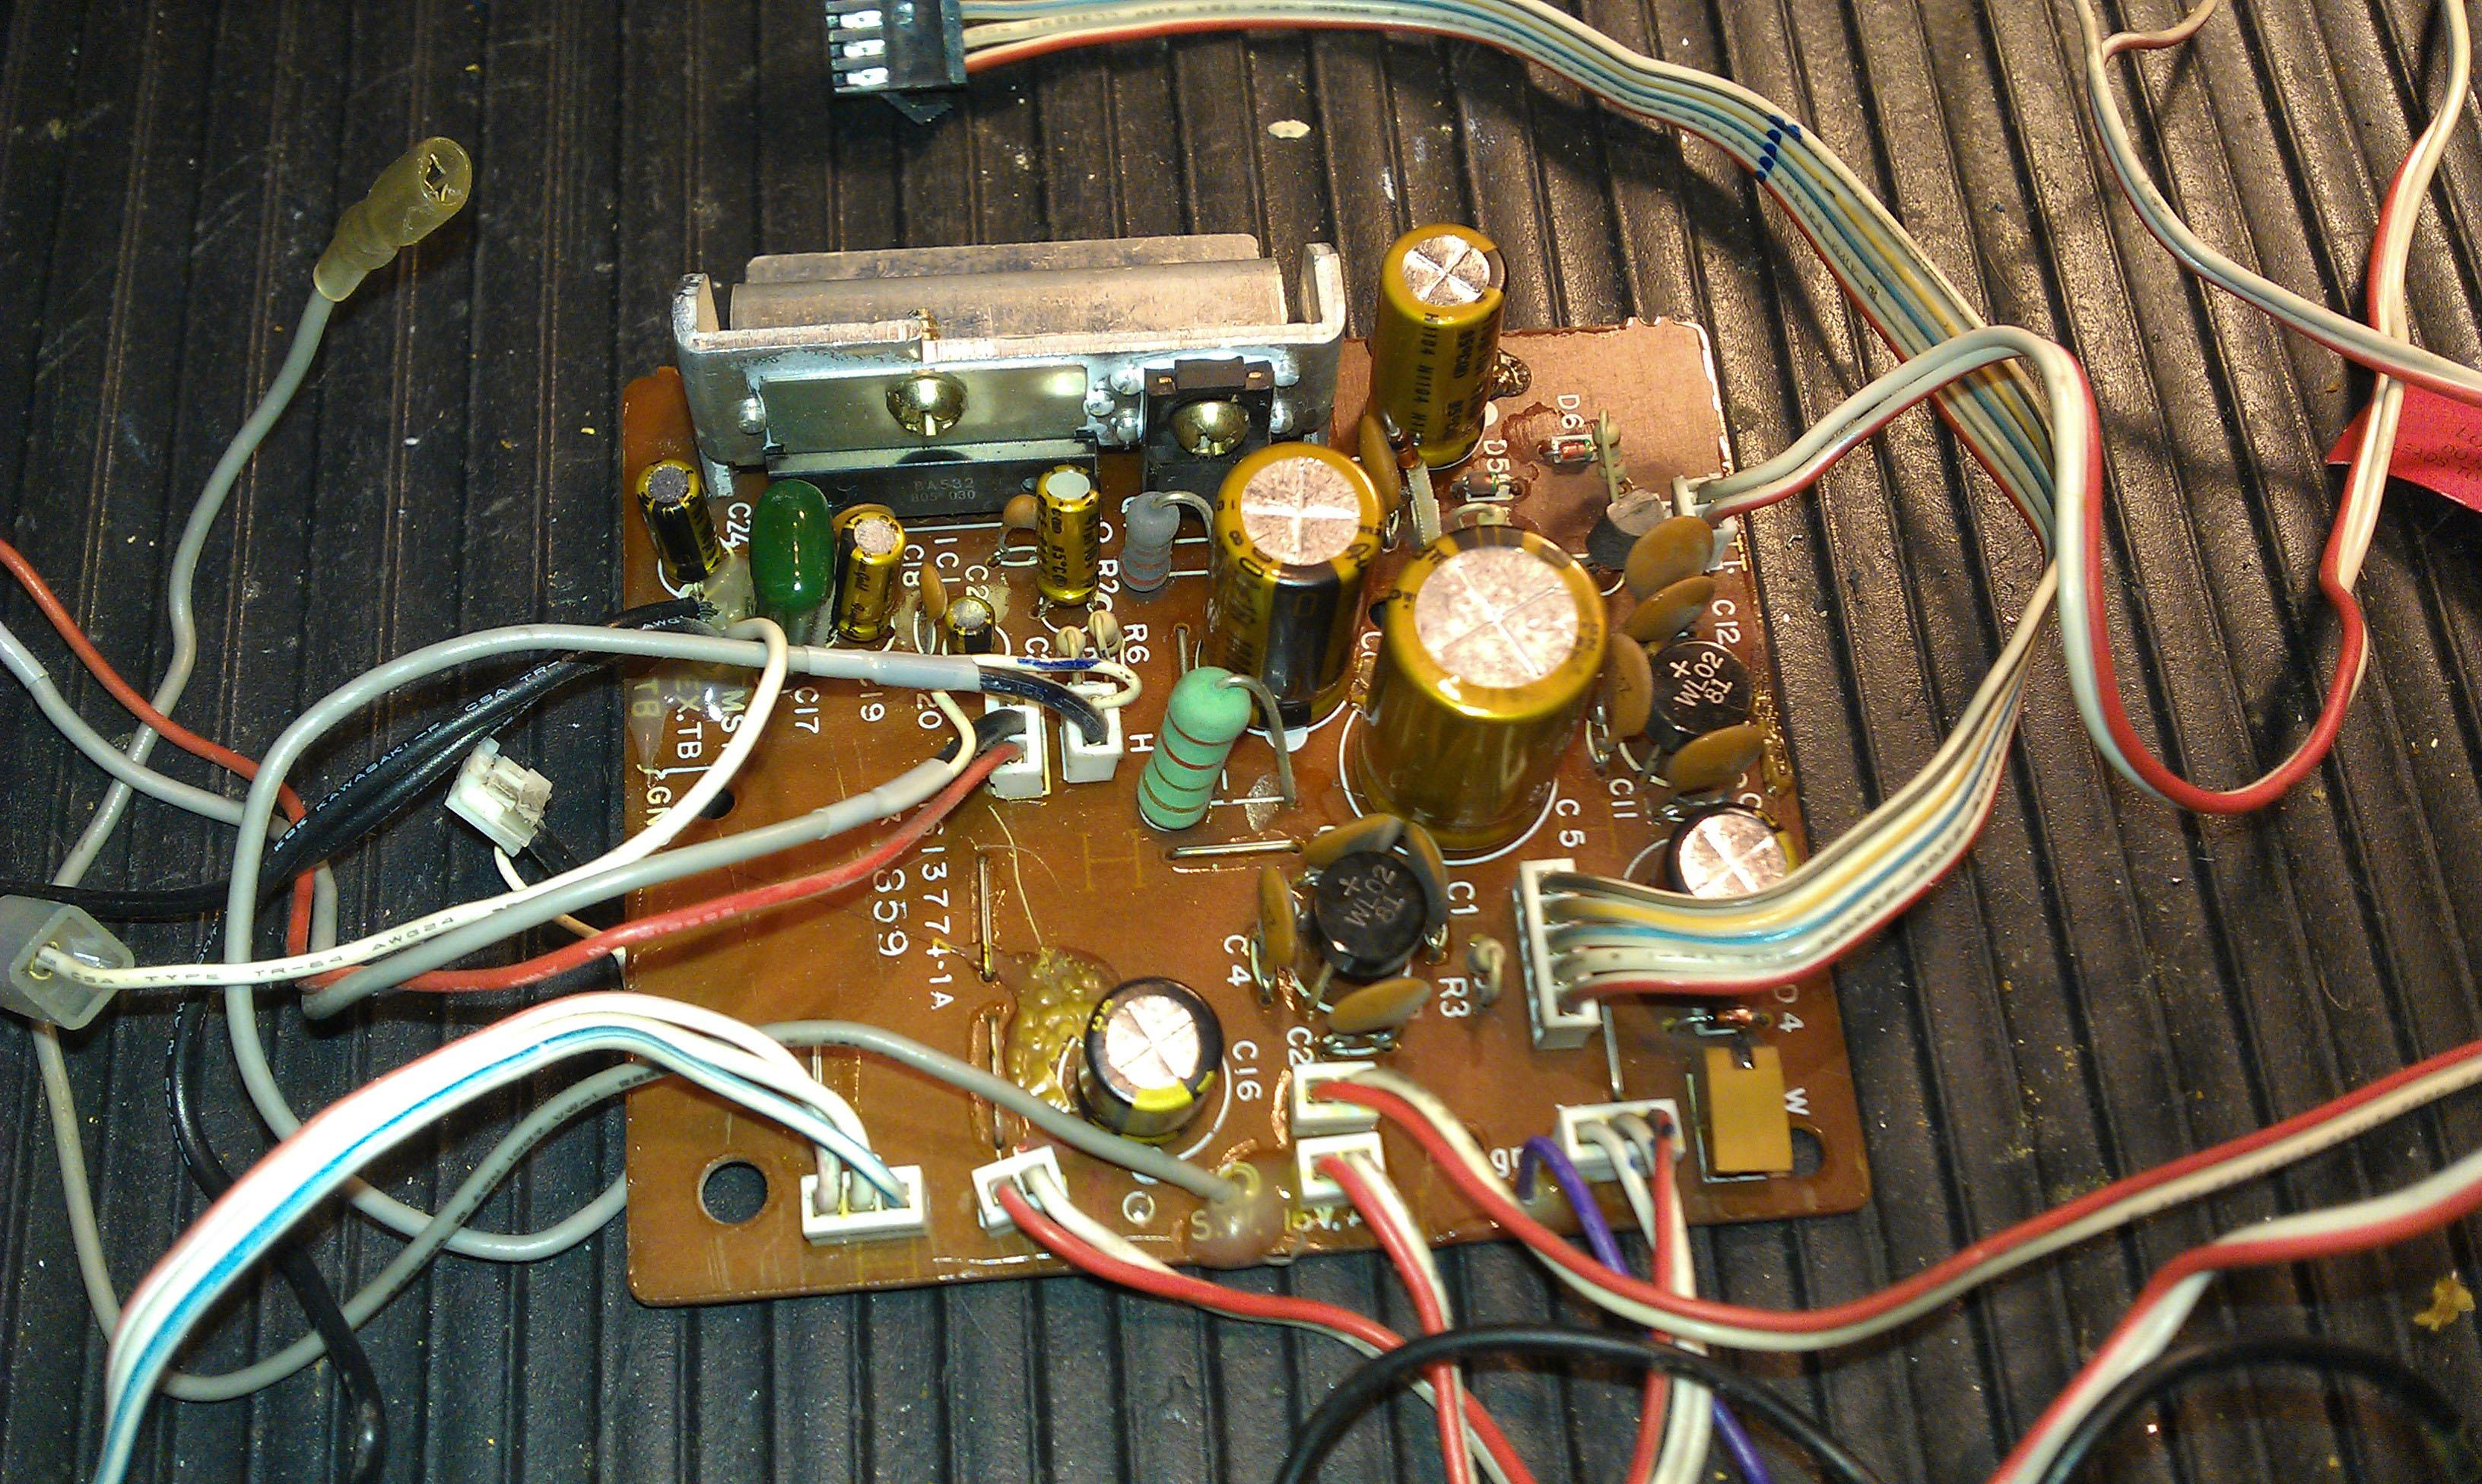 nutone im4006 power supply rebuild complete?__SQUARESPACE_CACHEVERSION=1357749019209 your site name im4006 nutone model im4006 radio cassette intercom nutone im 4006 wiring diagram at eliteediting.co